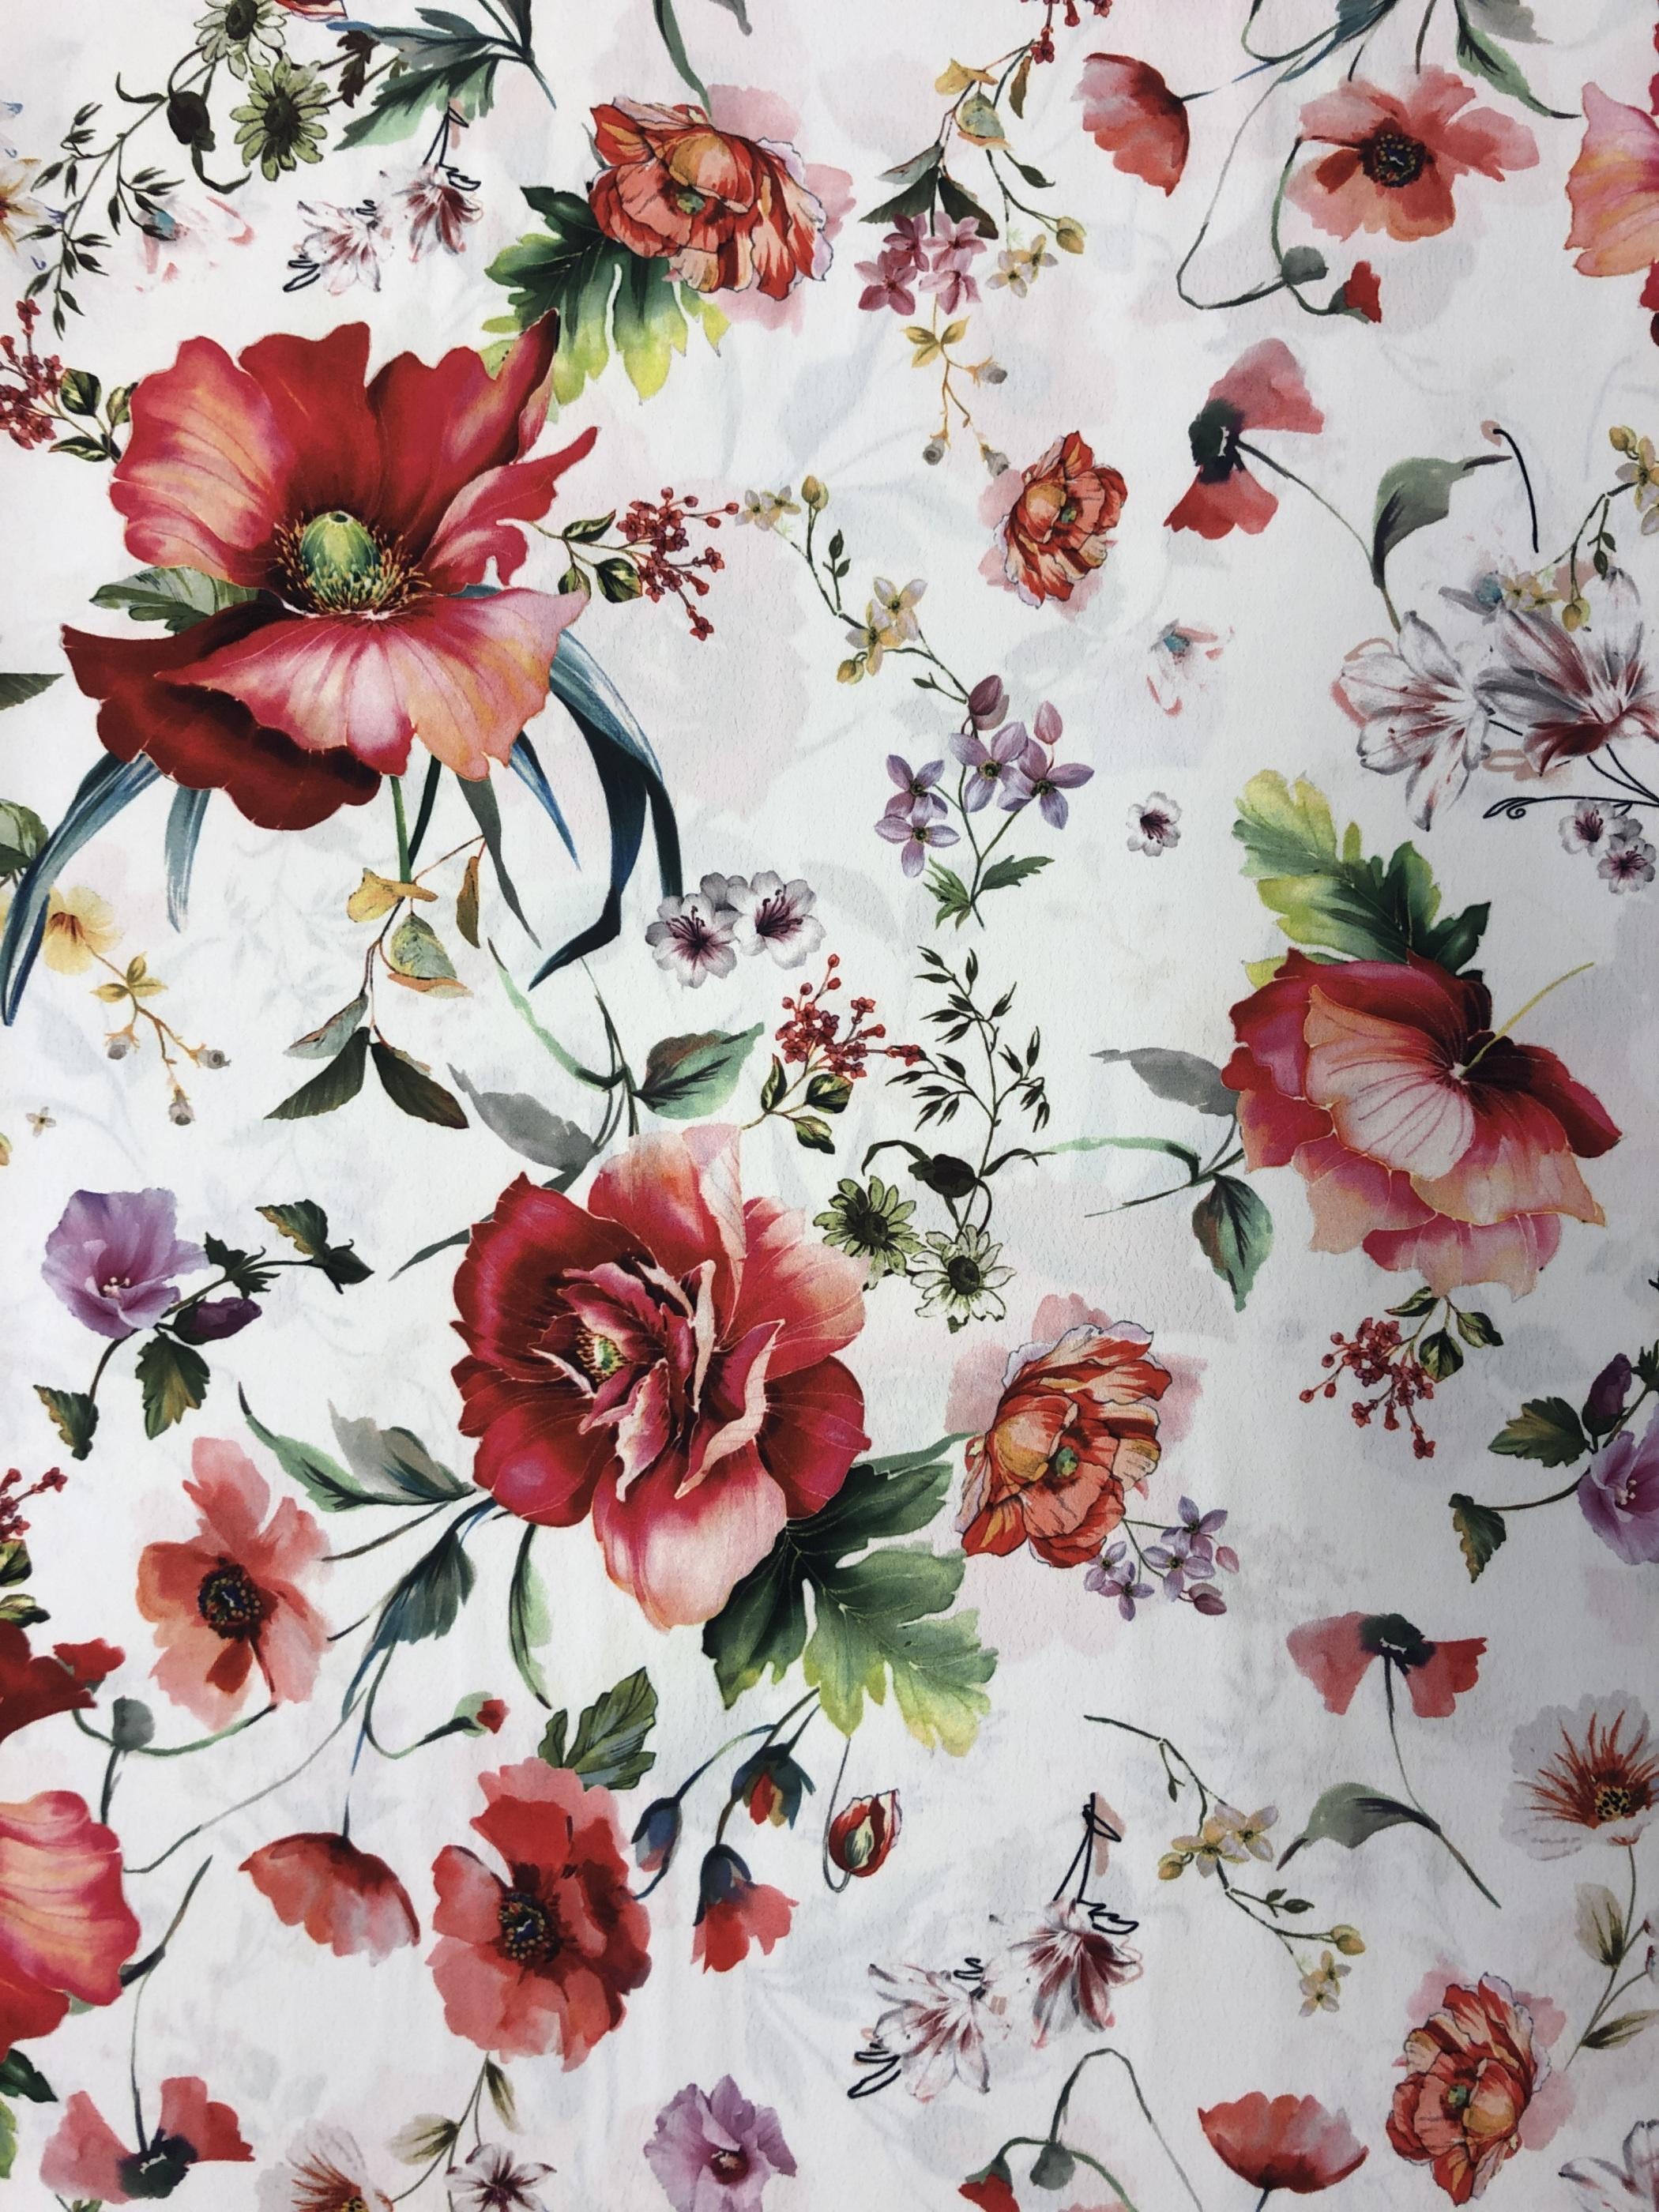 Sommarplock sommarblommor blommor metervara tyg vit klänning kjol blus Tyglust Laholm